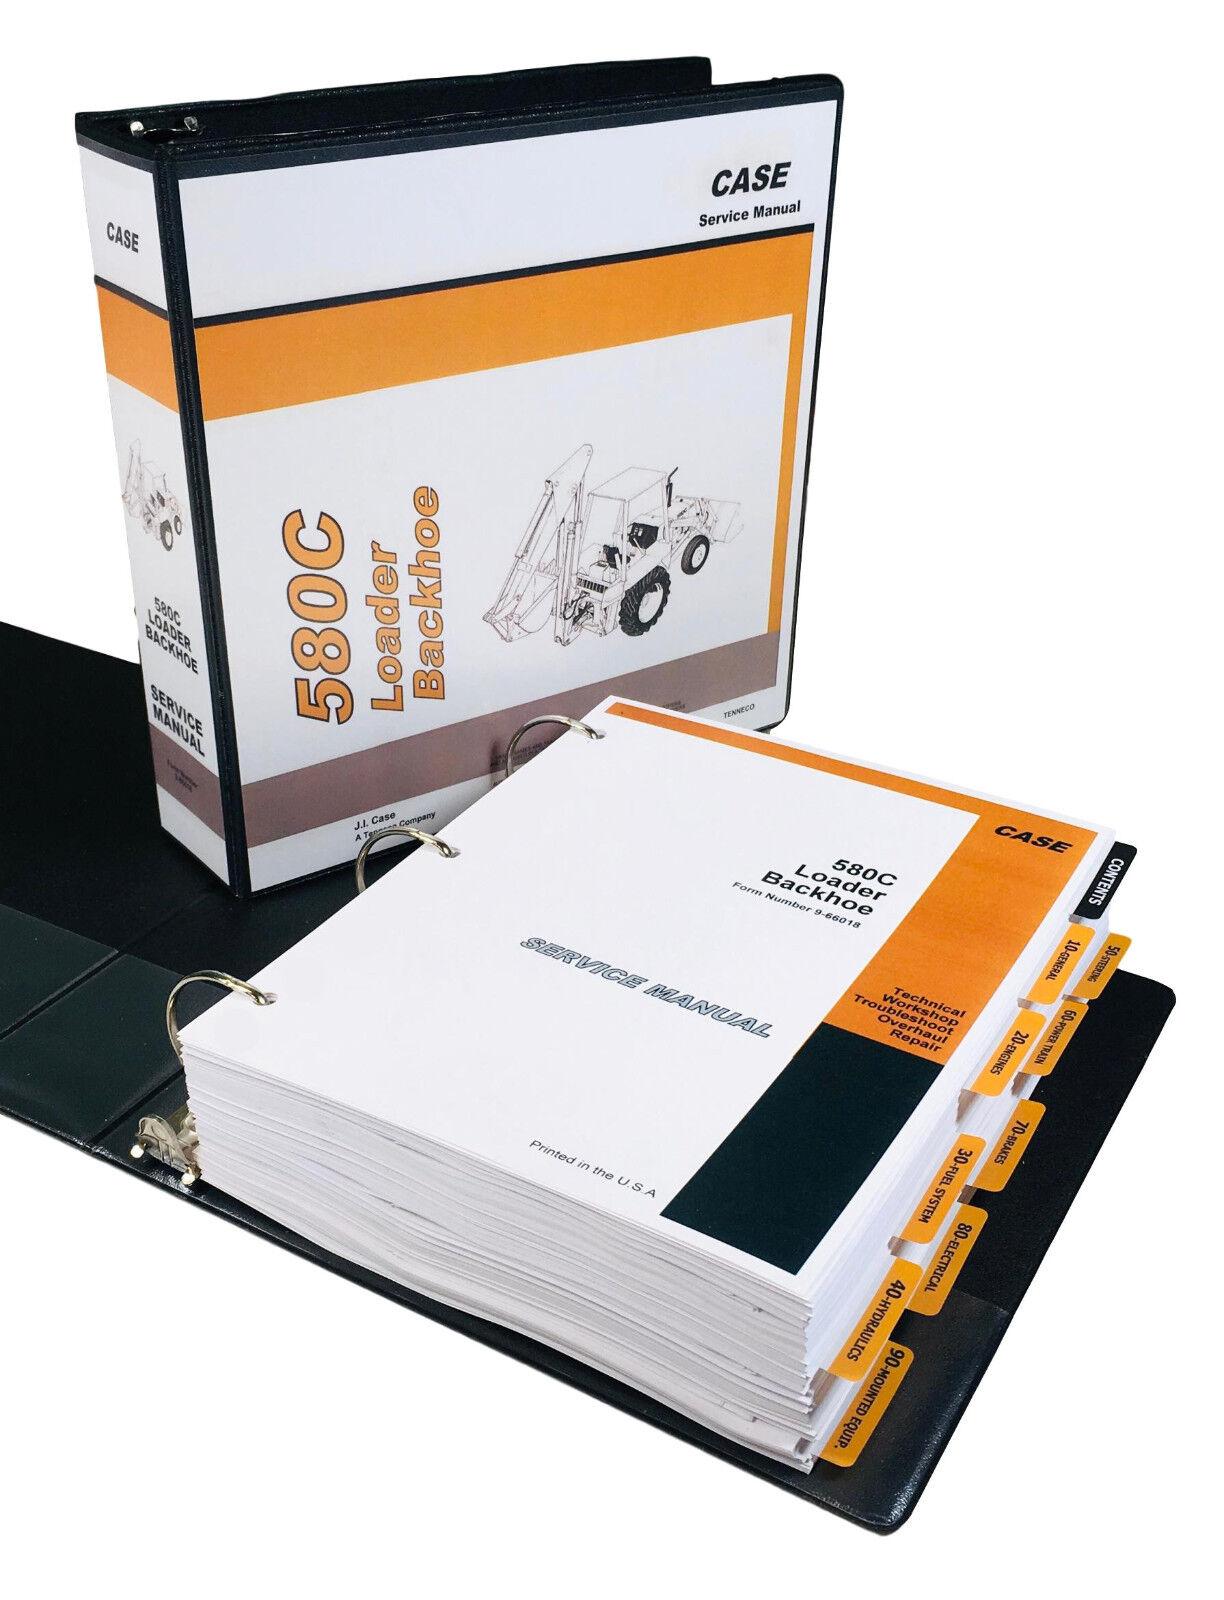 Complete Service/Overhaul/Repair Manuals